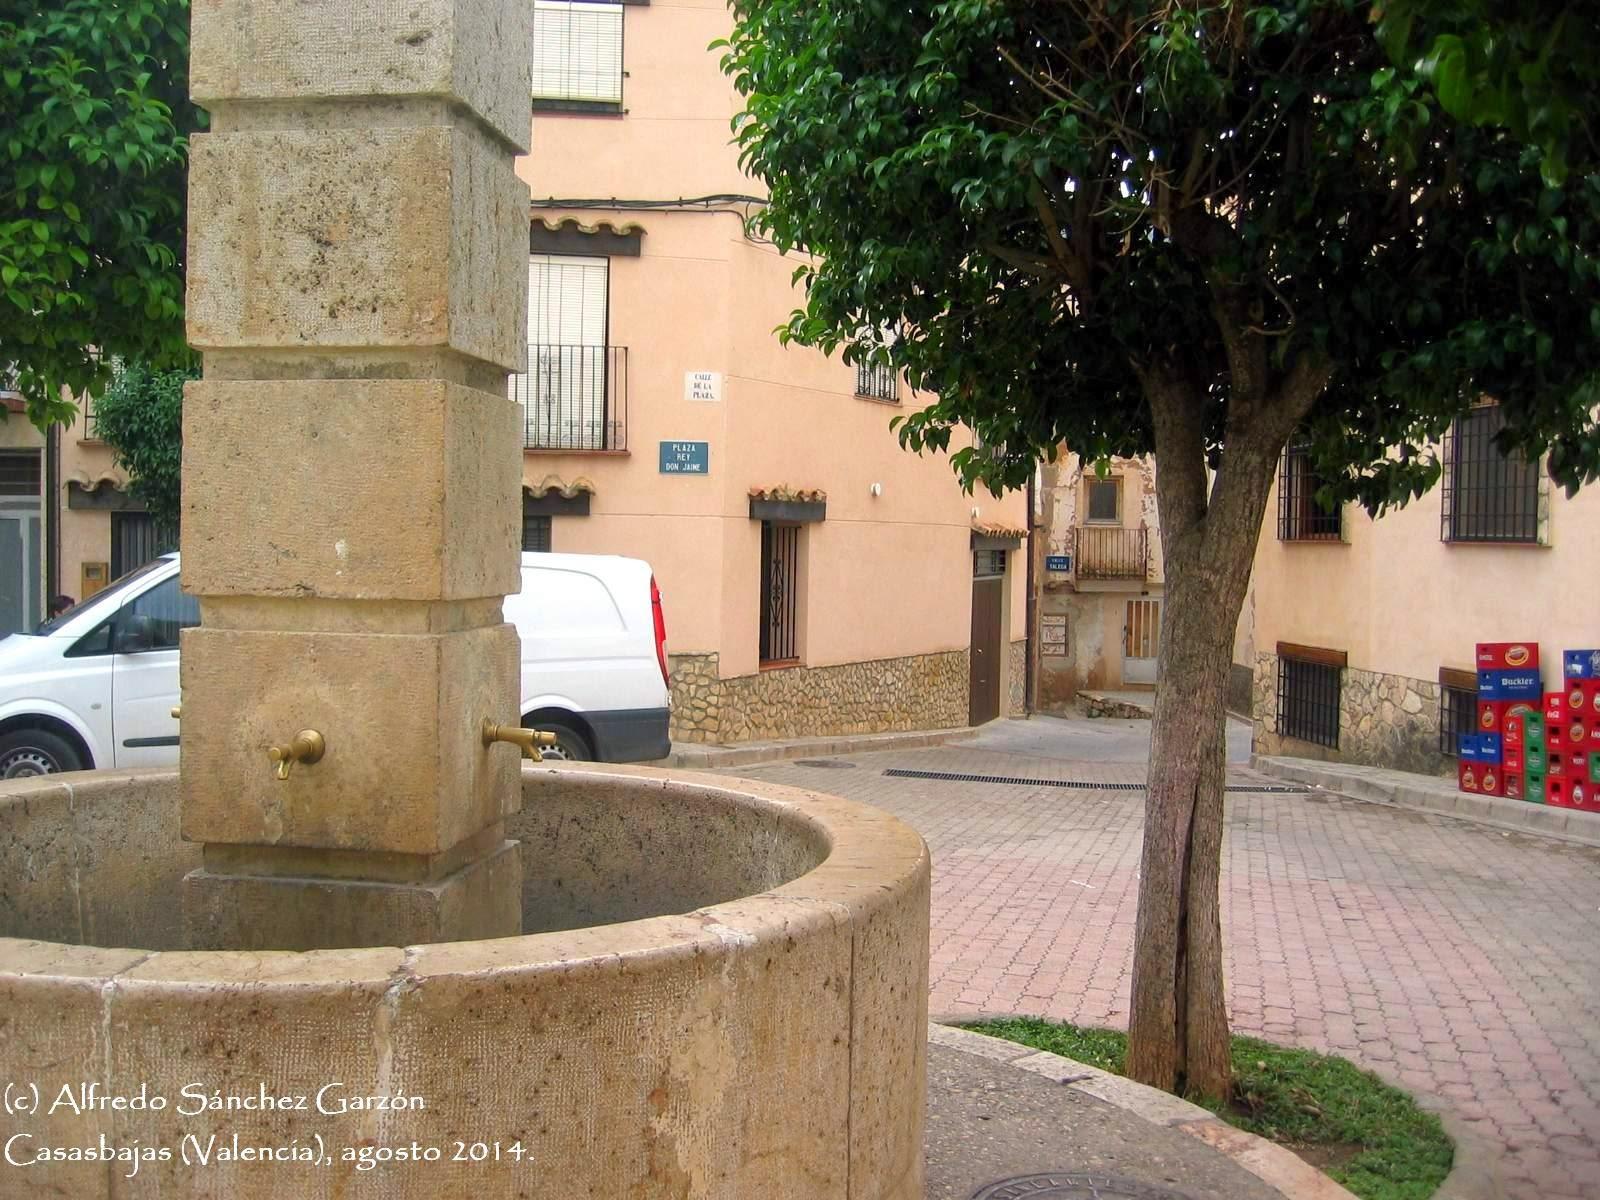 casasbajas-plaza-rey-jaime-fuente